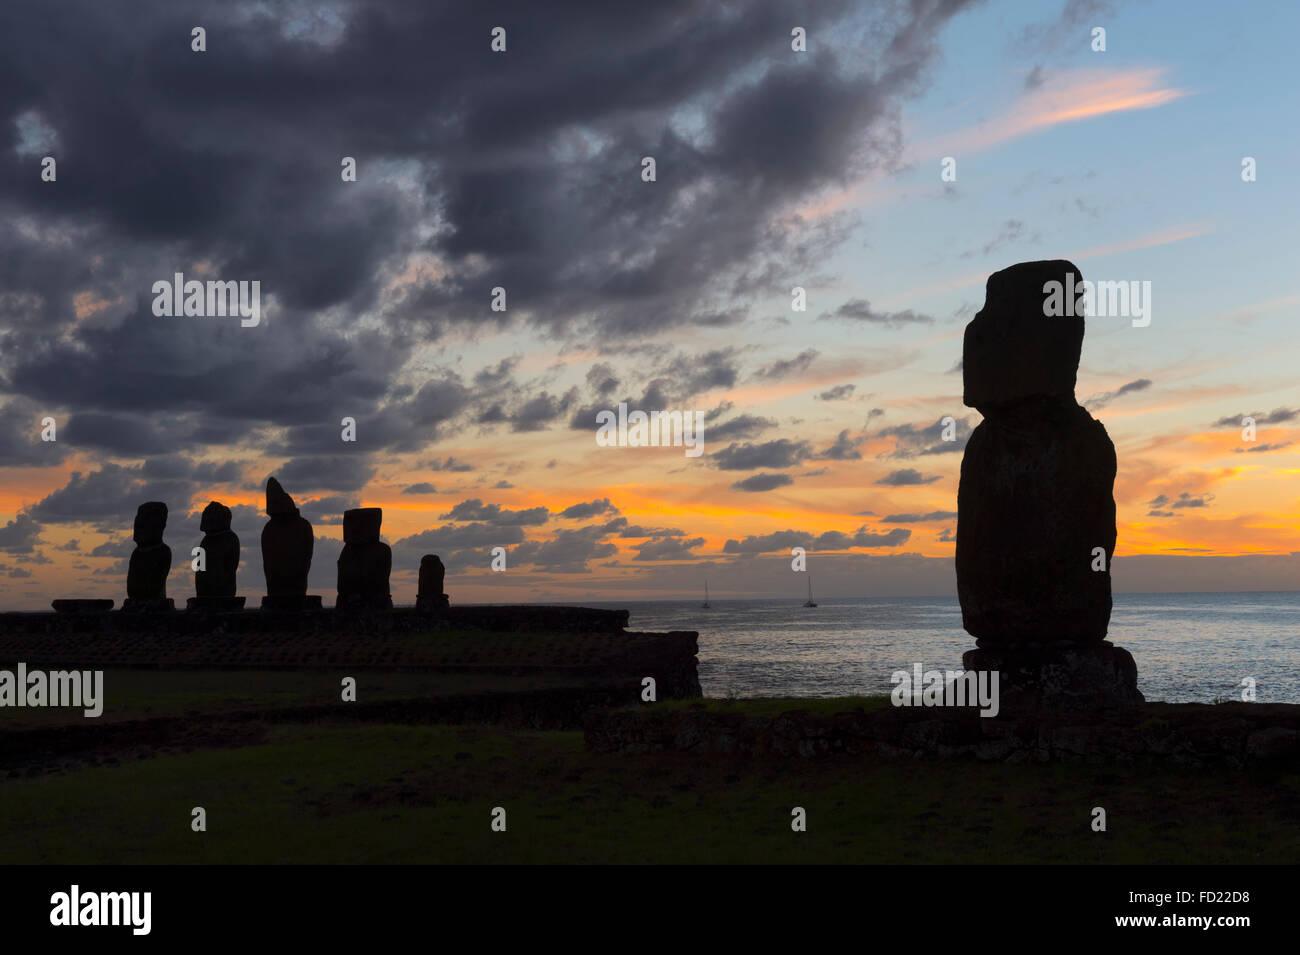 Tahai Zeremoniell komplexe bei Sonnenuntergang, Hanga Roa, Nationalpark Rapa Nui, Osterinsel, Chile, UNESCO-Welterbe Stockbild